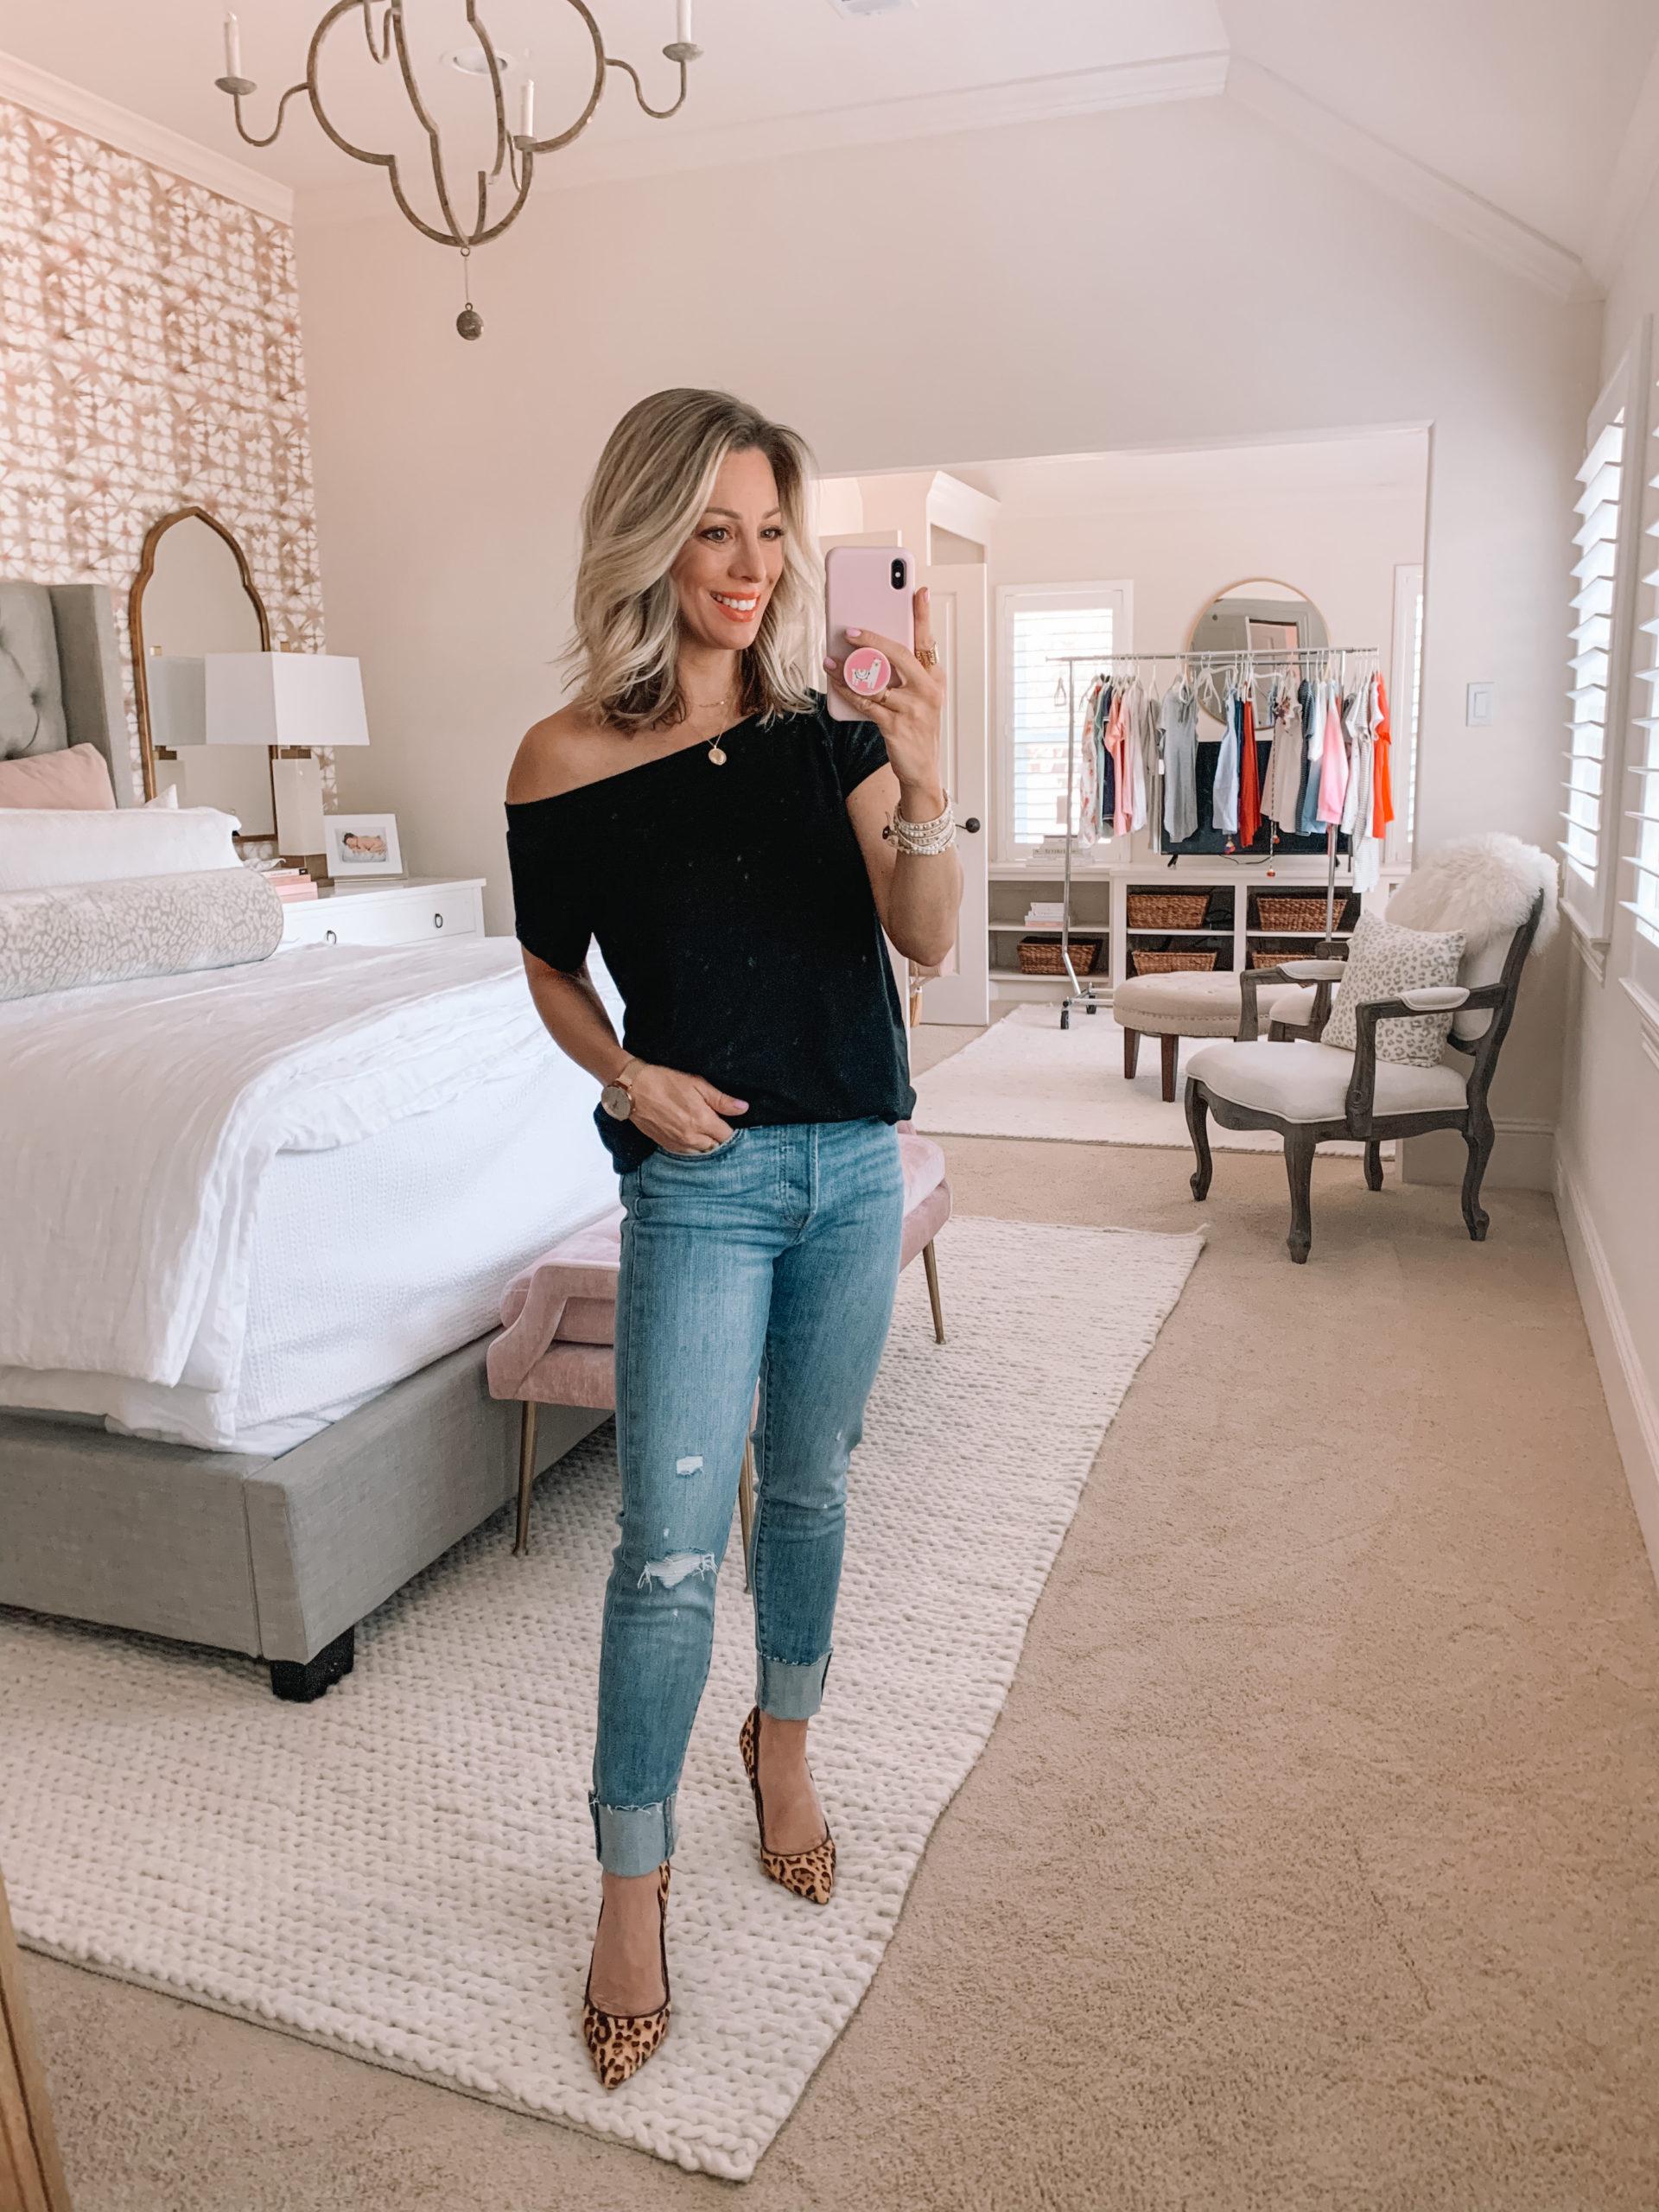 Amazon Haul - Black Short Sleeved Off the Shoulder Tee, Skinny Jeans, Leopard Heels